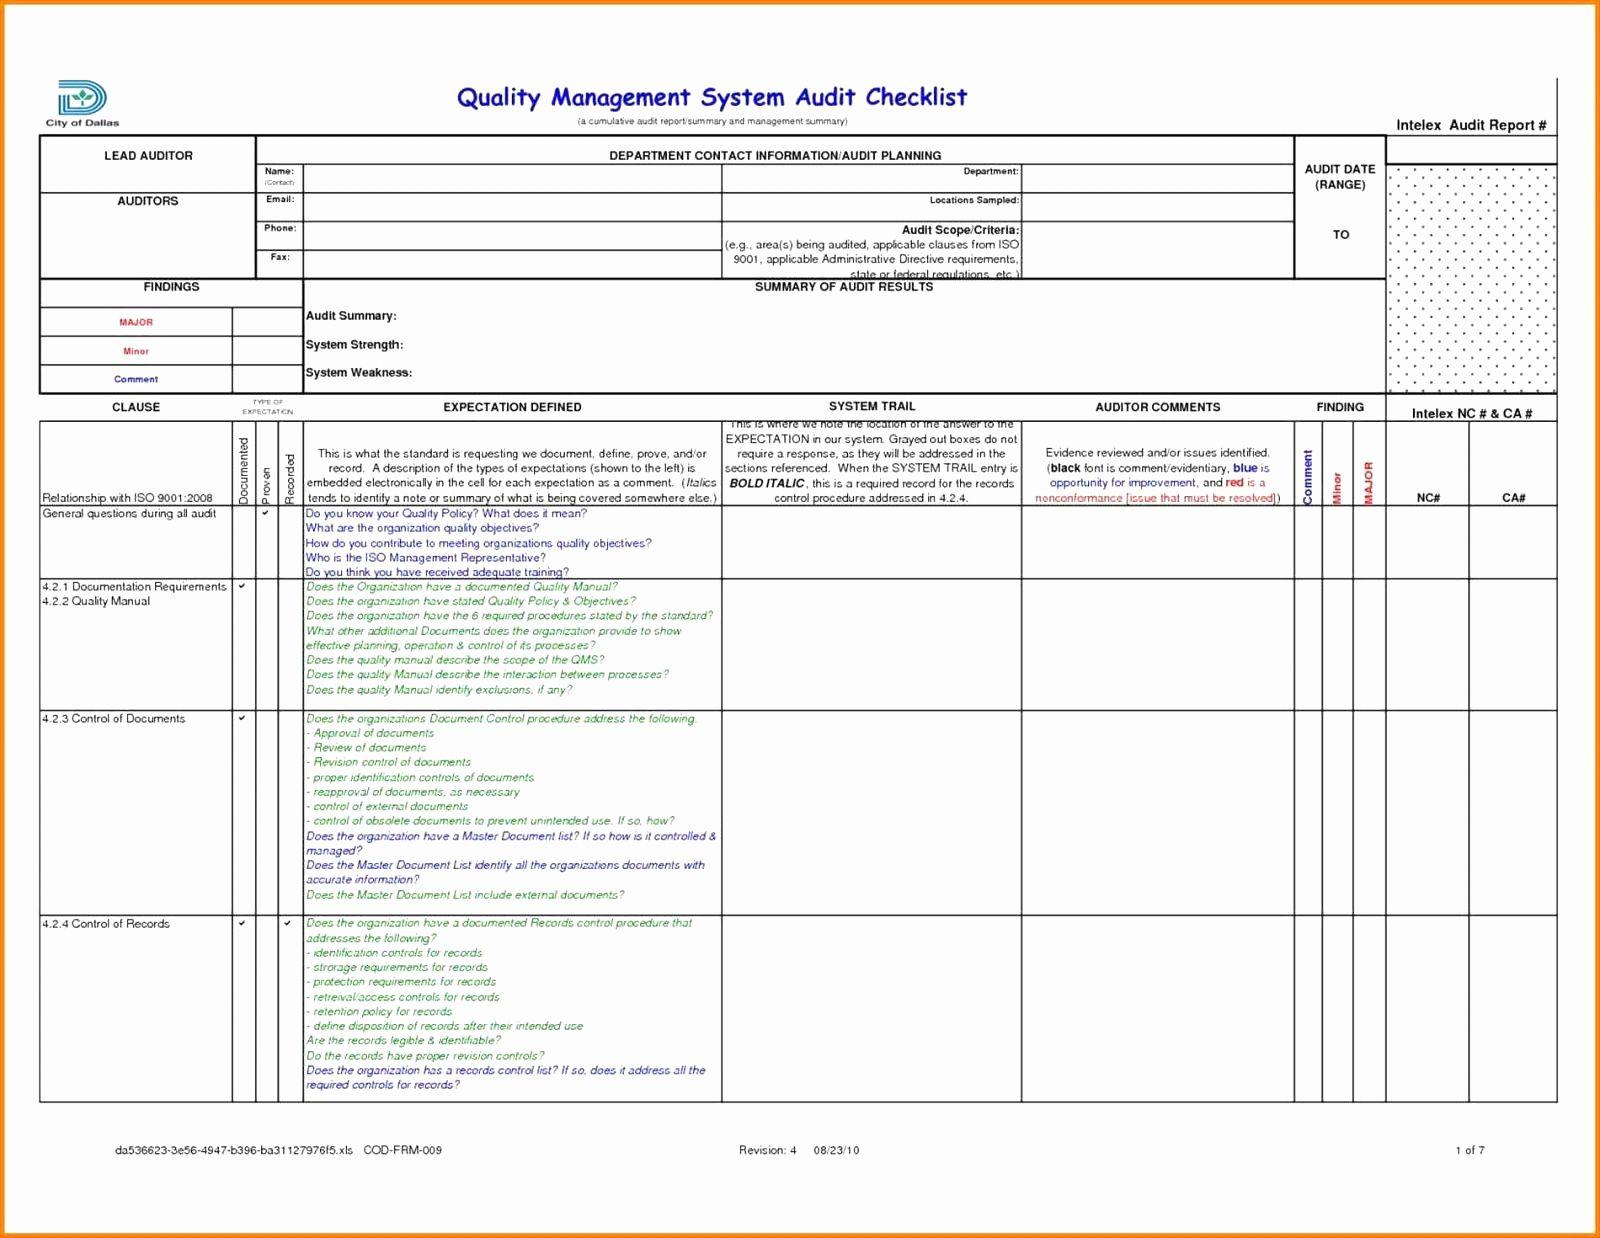 Samples Of Iso 9001 Audit Checklist Excel Xls Template Throughout Iso 9001 Audit Checklist Excel Xls Template Samples